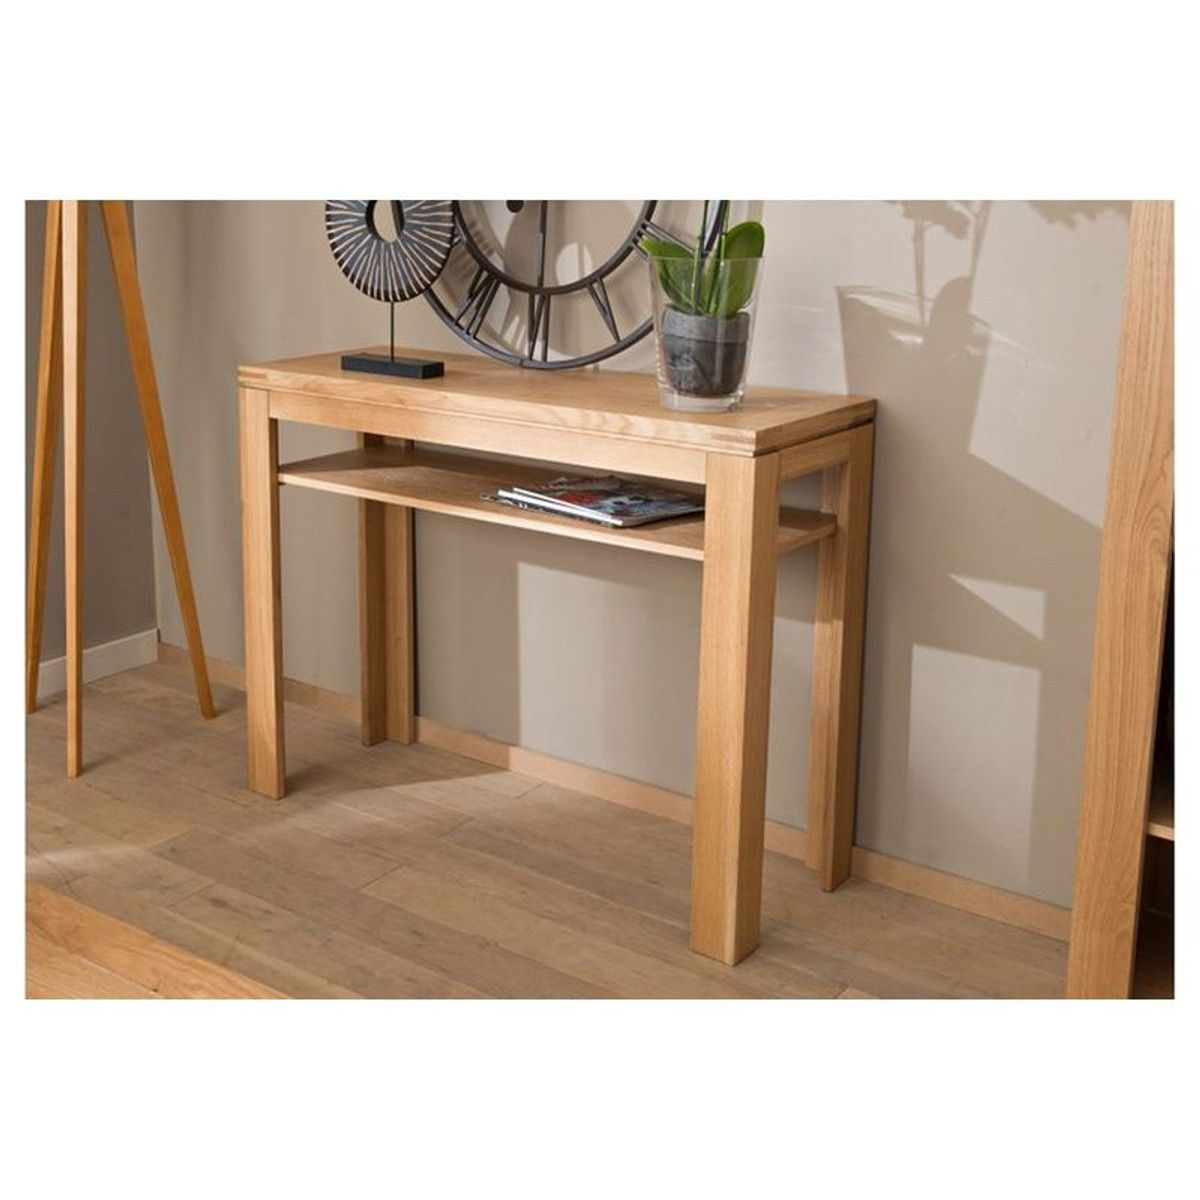 Table En Bois Chene Clair console boston - bois chêne clair massif - taille : taille